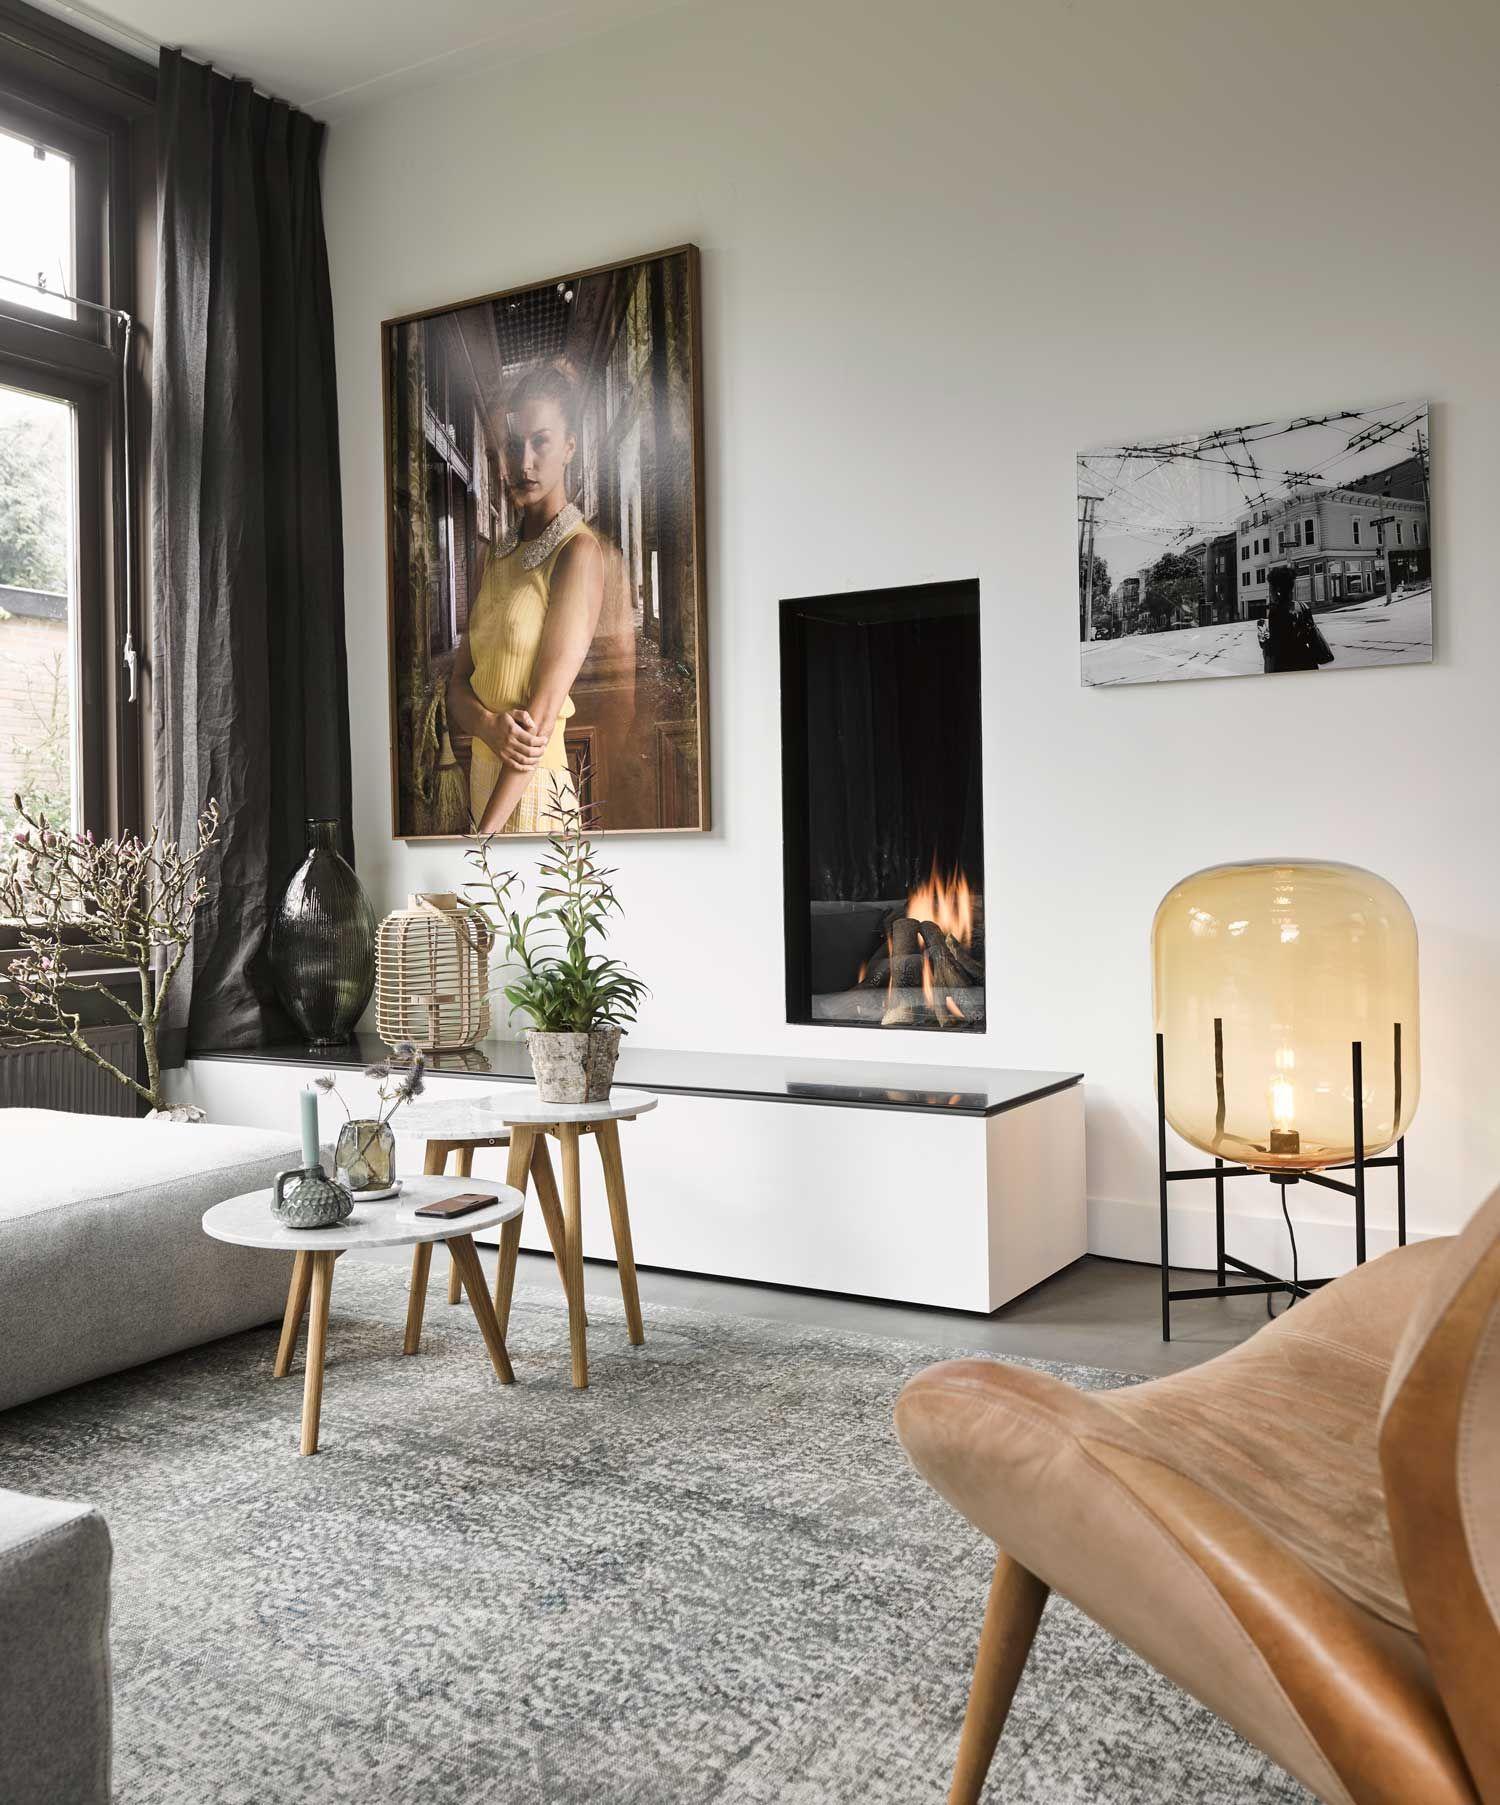 Interiordesign #livingroom #couch #carpet #art #lighting #woonkamer ...